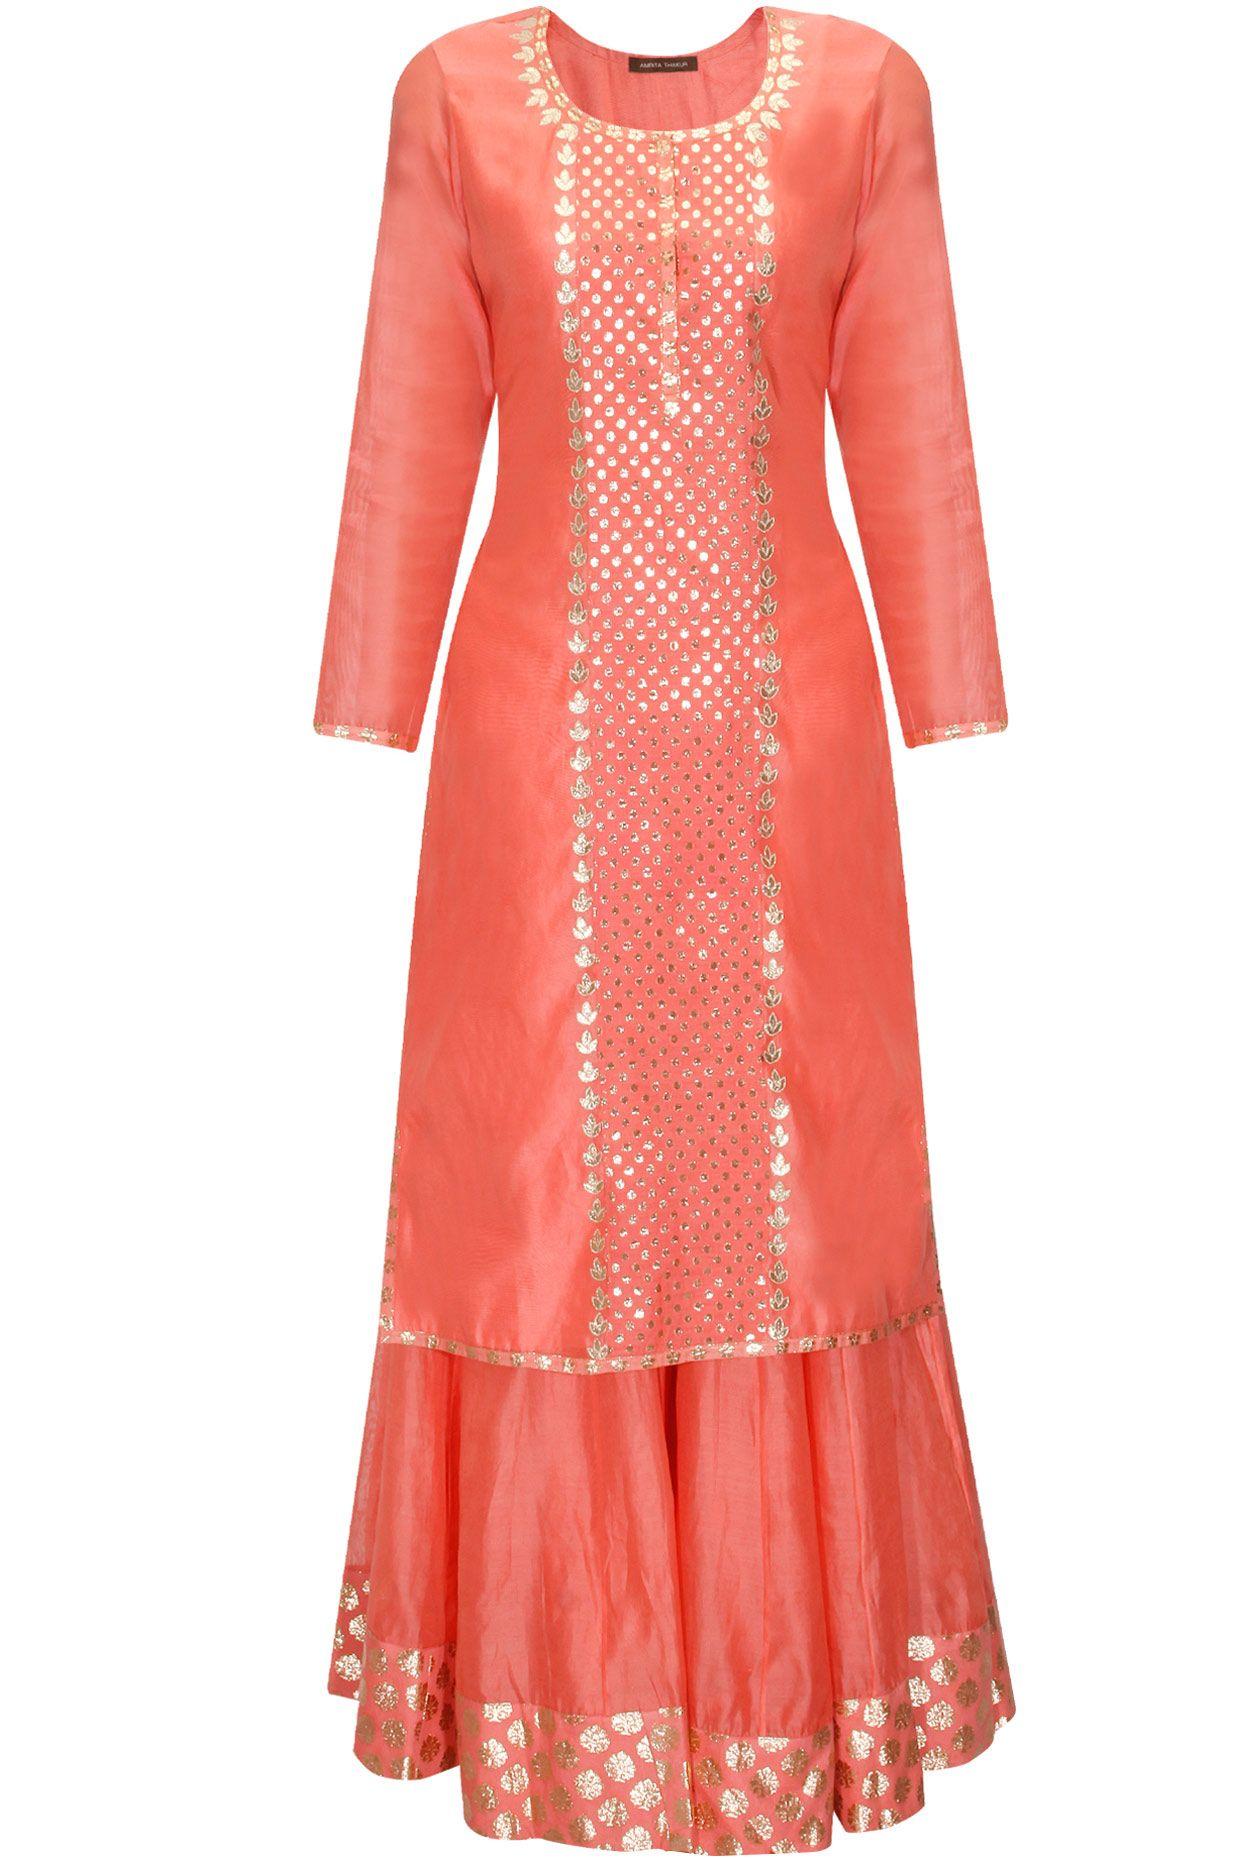 00b6258923 Dark peach and mint green applique work kurta and sharara pants set  available only at Pernia's Pop Up Shop.